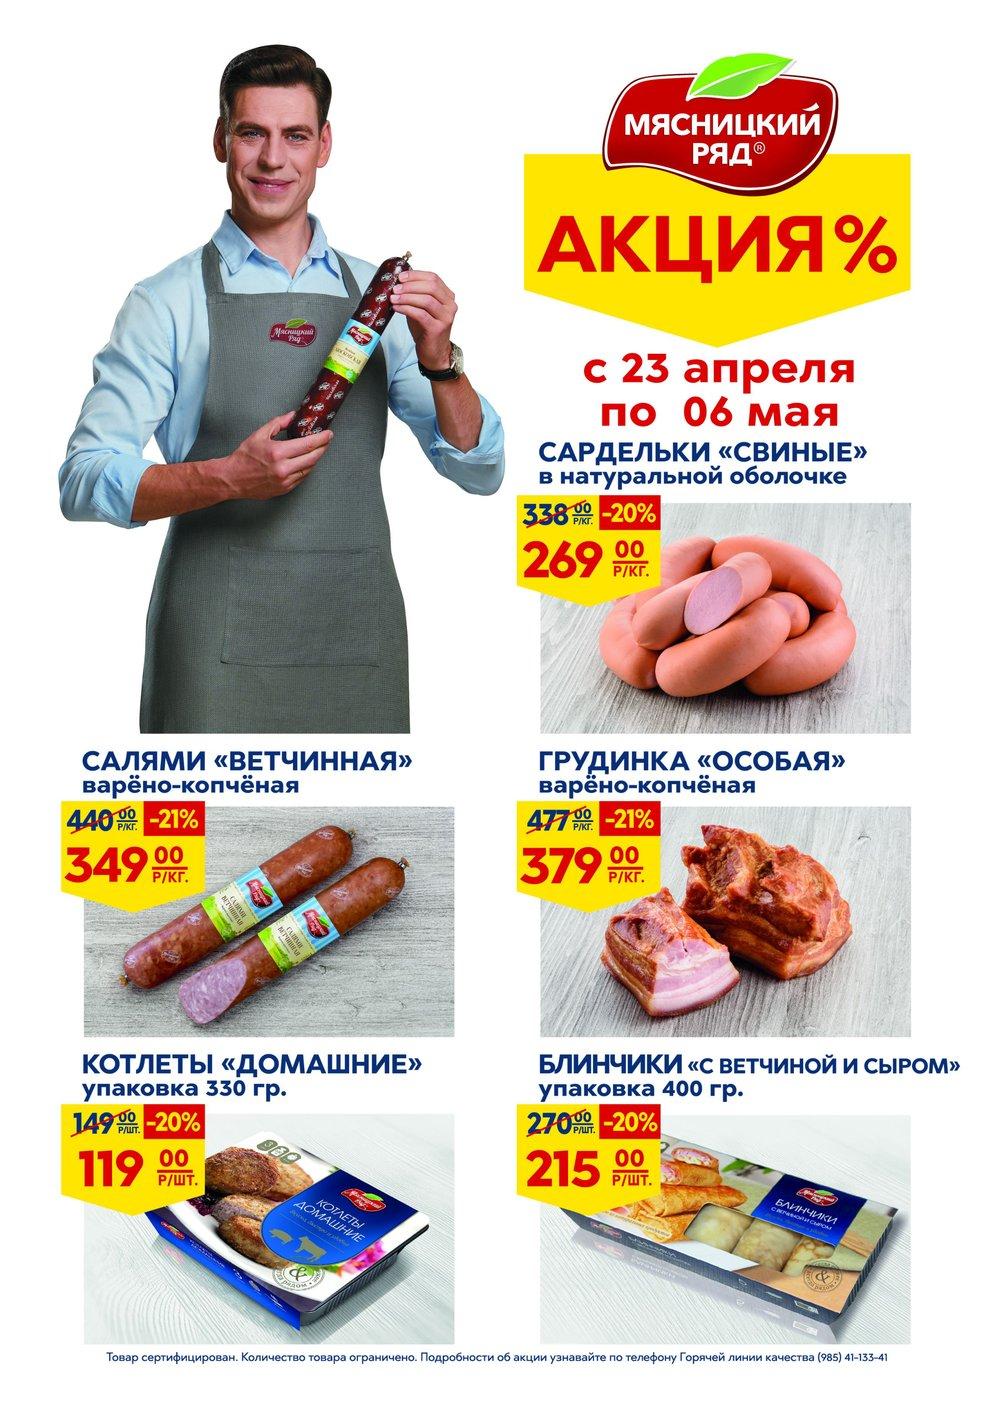 Каталог акций Мясницкий ряд с 23 апреля по 6 мая 2018 - стр. 1